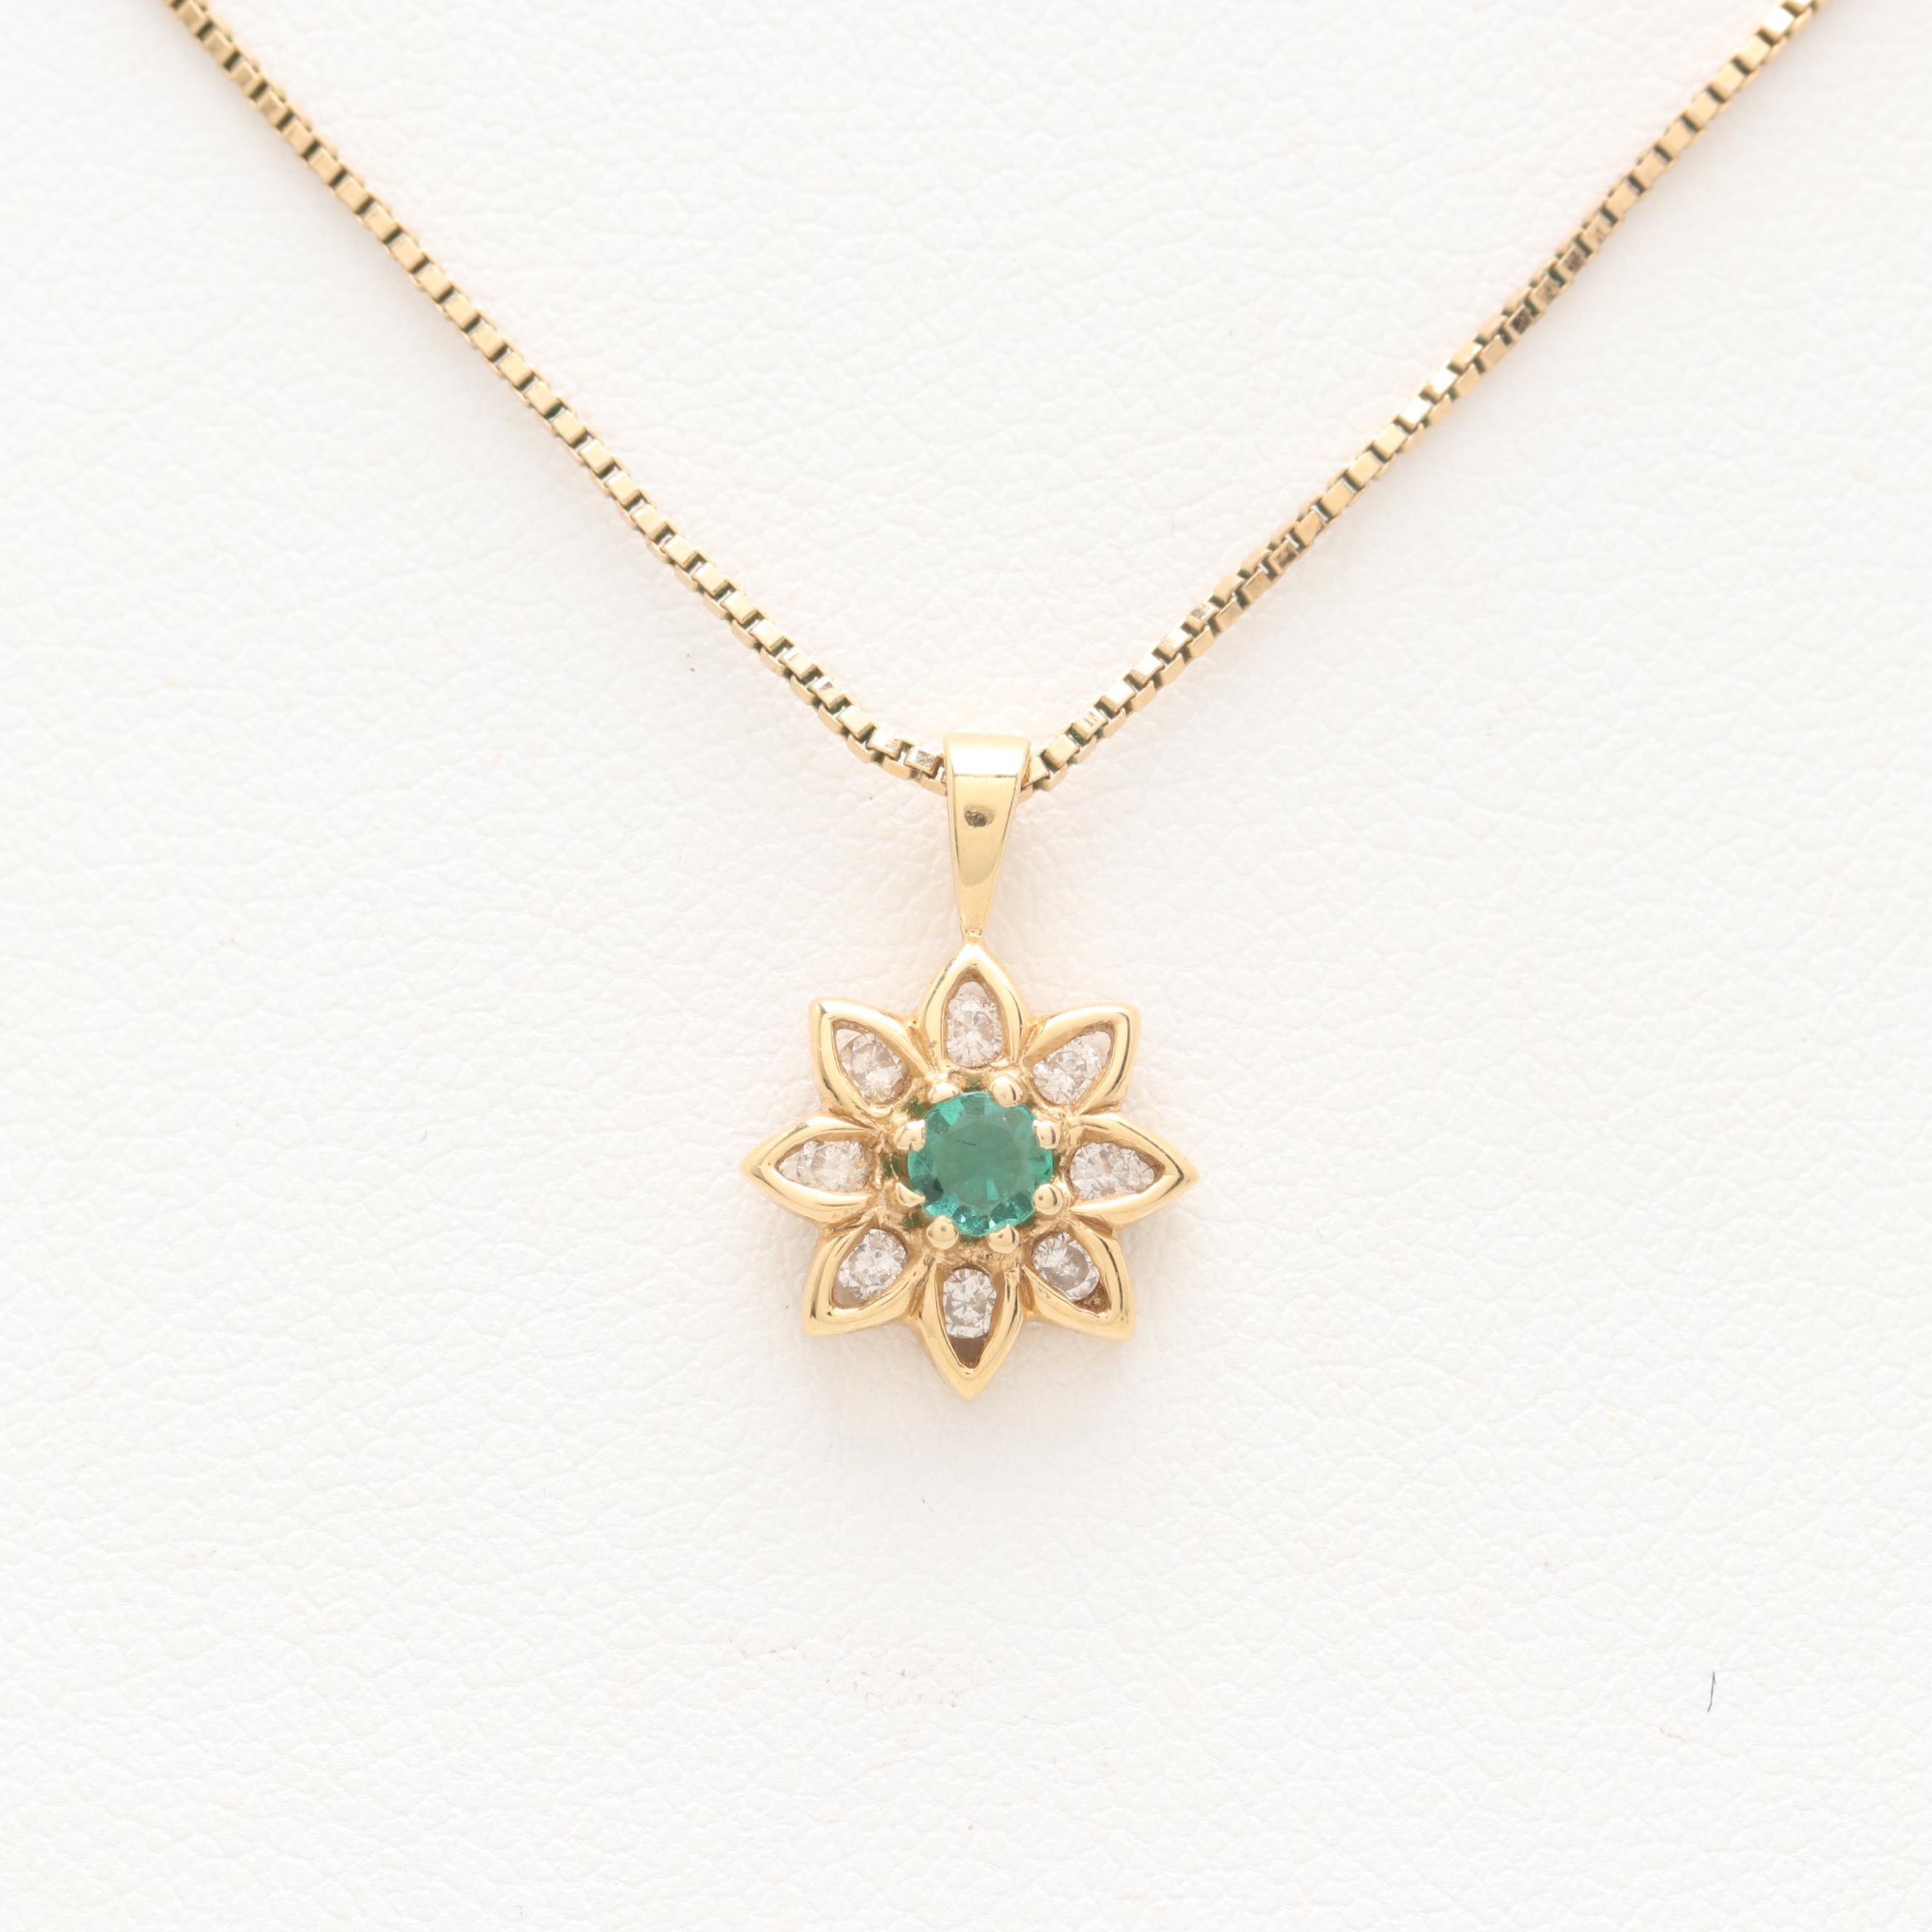 18K Yellow Gold Emerald and Diamond Pendant on 14K Yellow Gold Chain